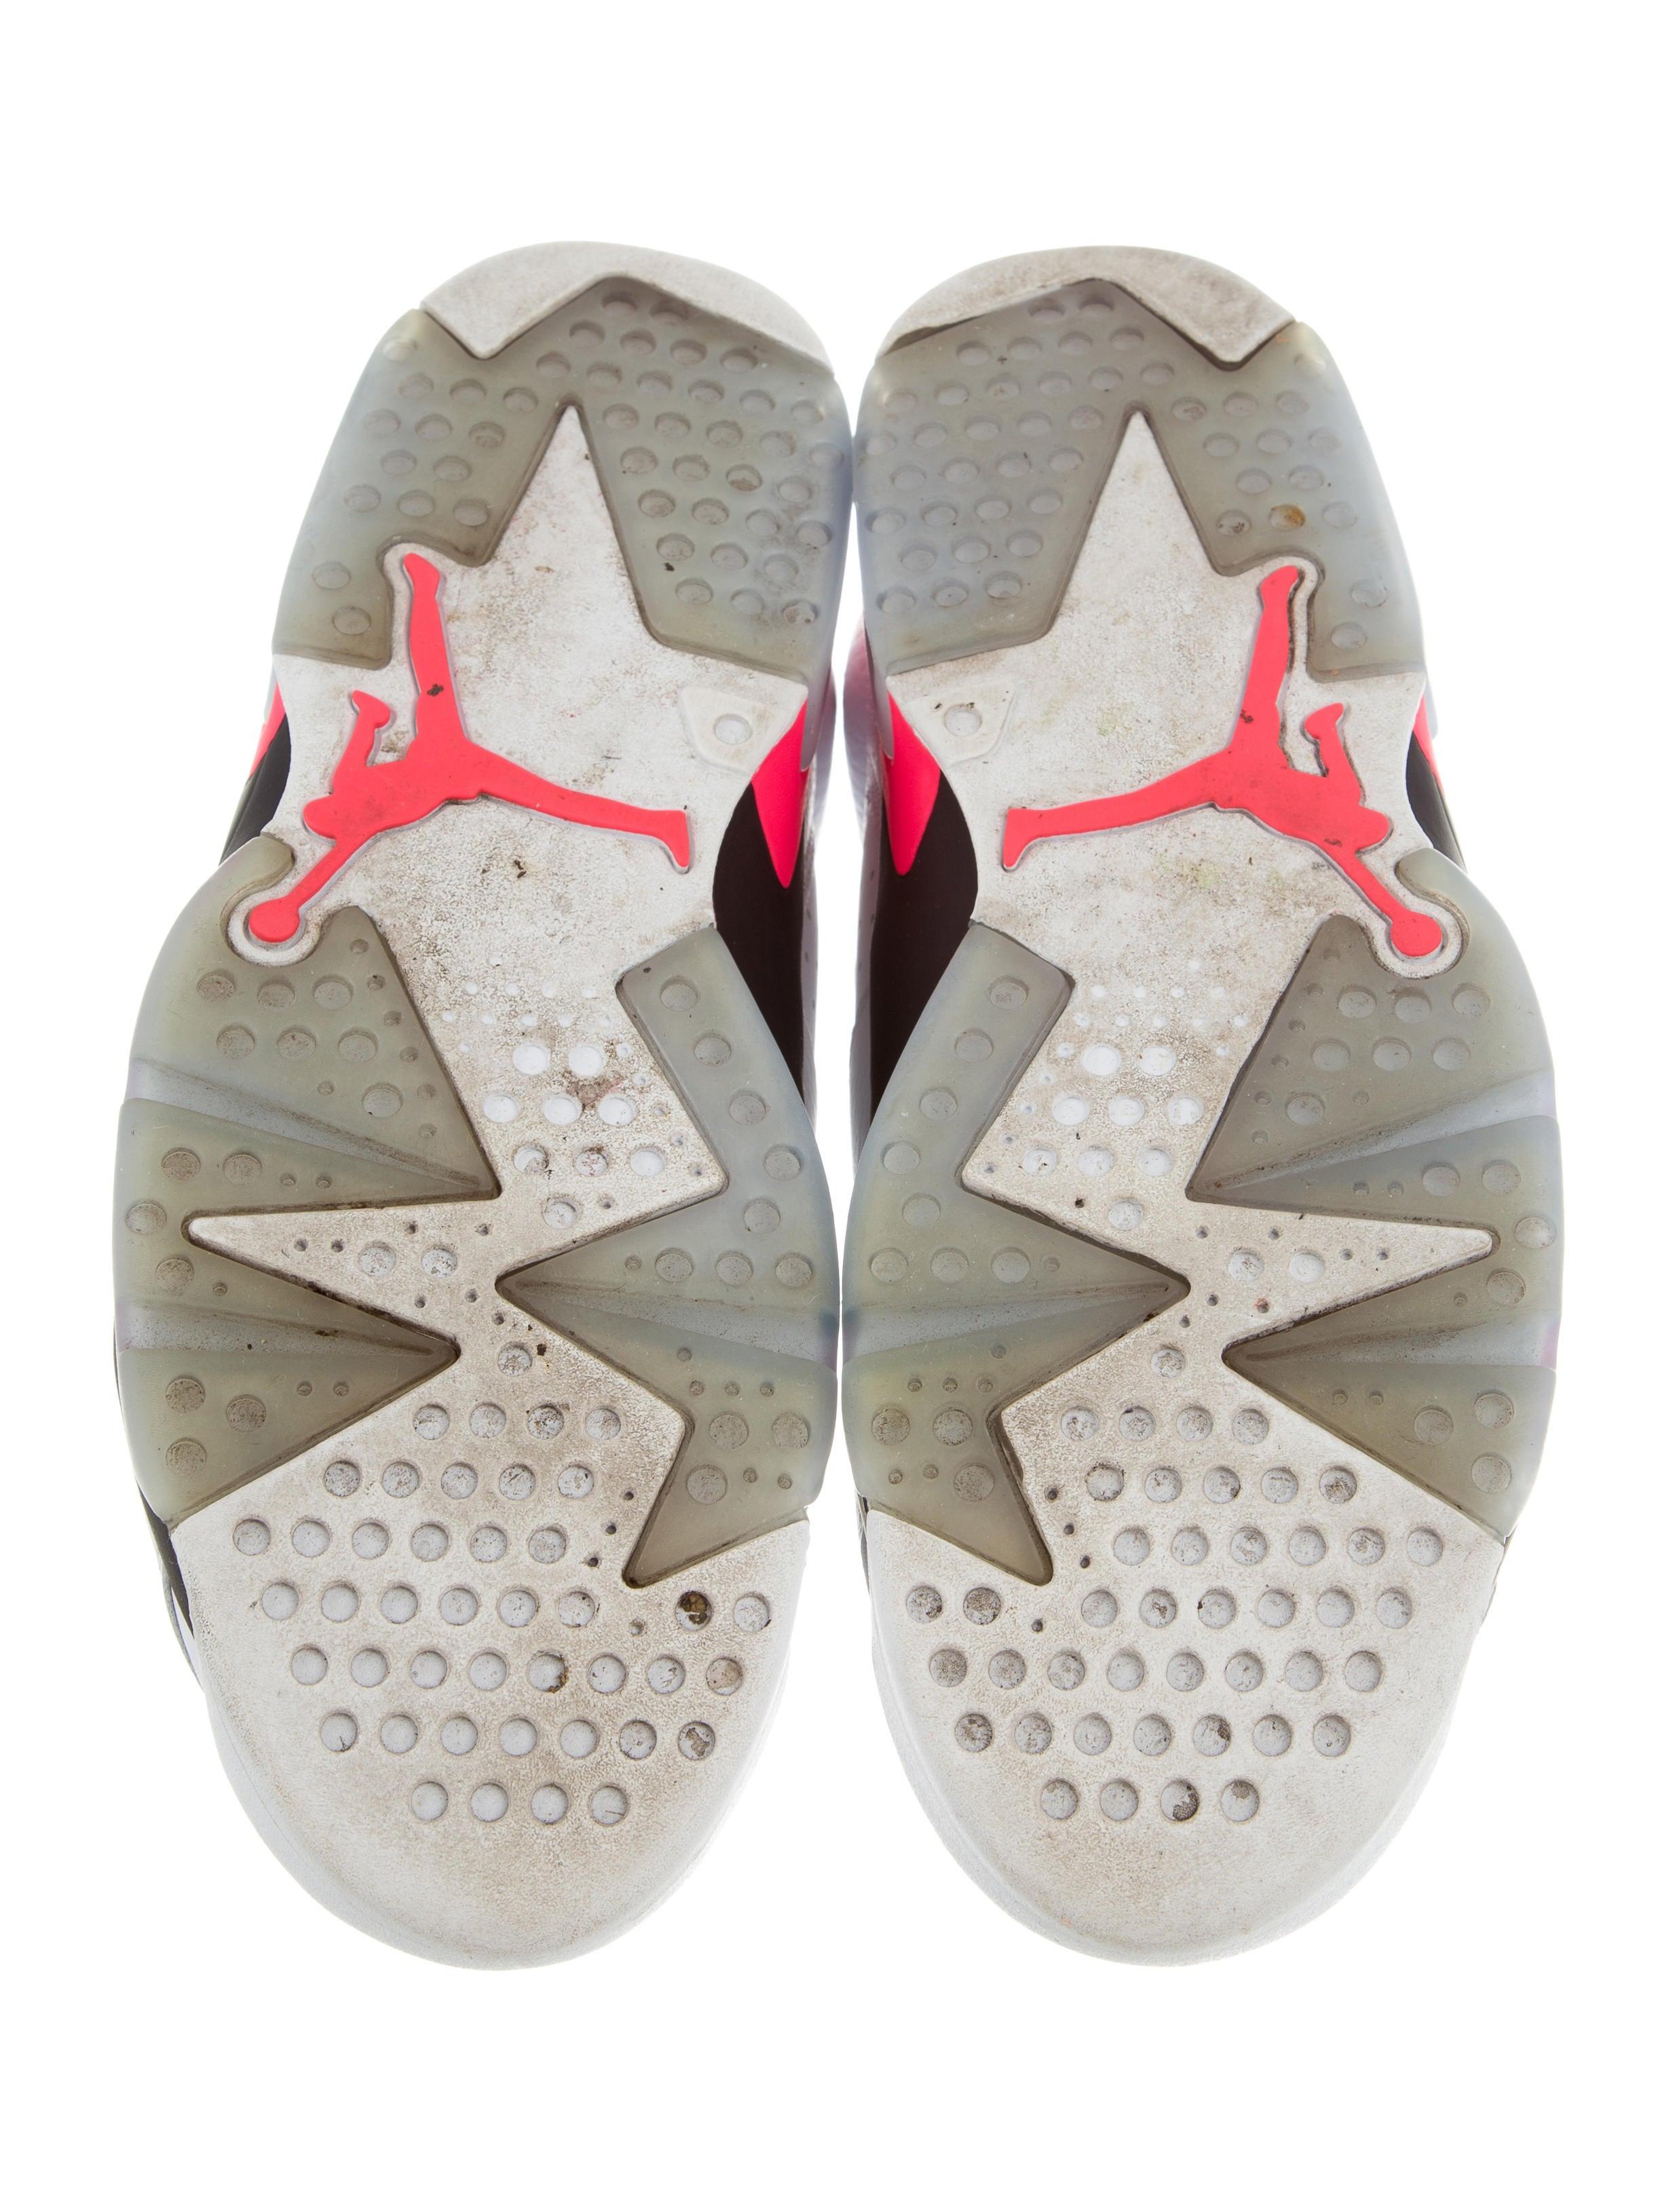 Nike Air Jordan 6 Retro Low Infrared Sneakers Shoes Wniaj20543 The Realreal